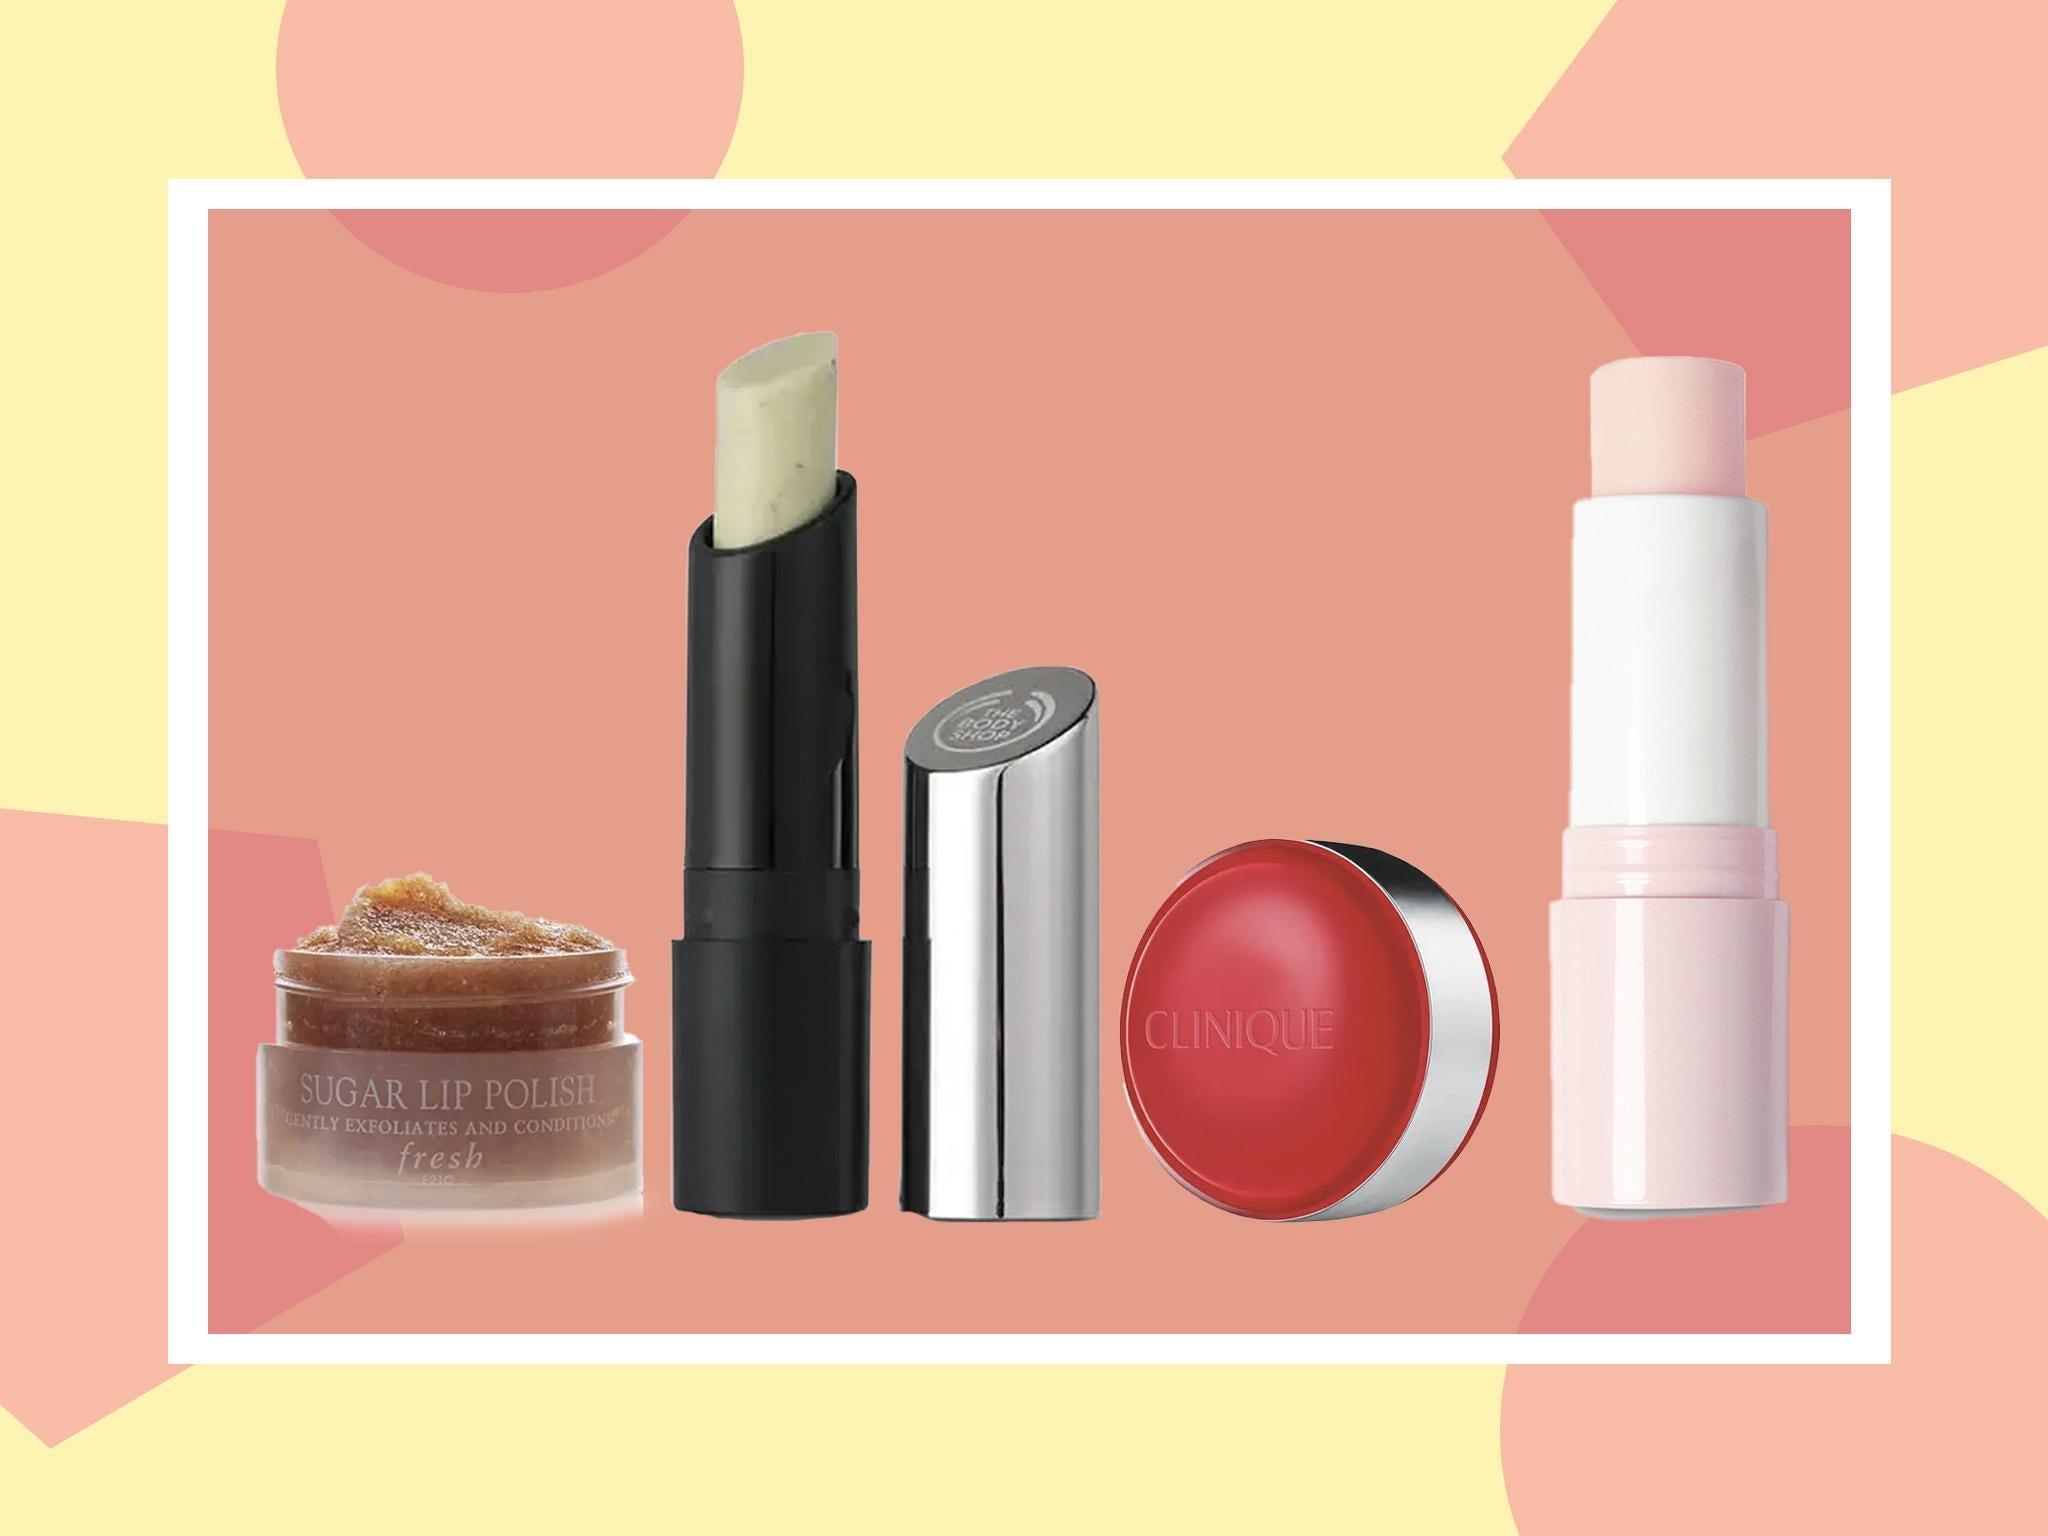 10 Best Lip Balm (2019) Reviews & Buyer's Guide